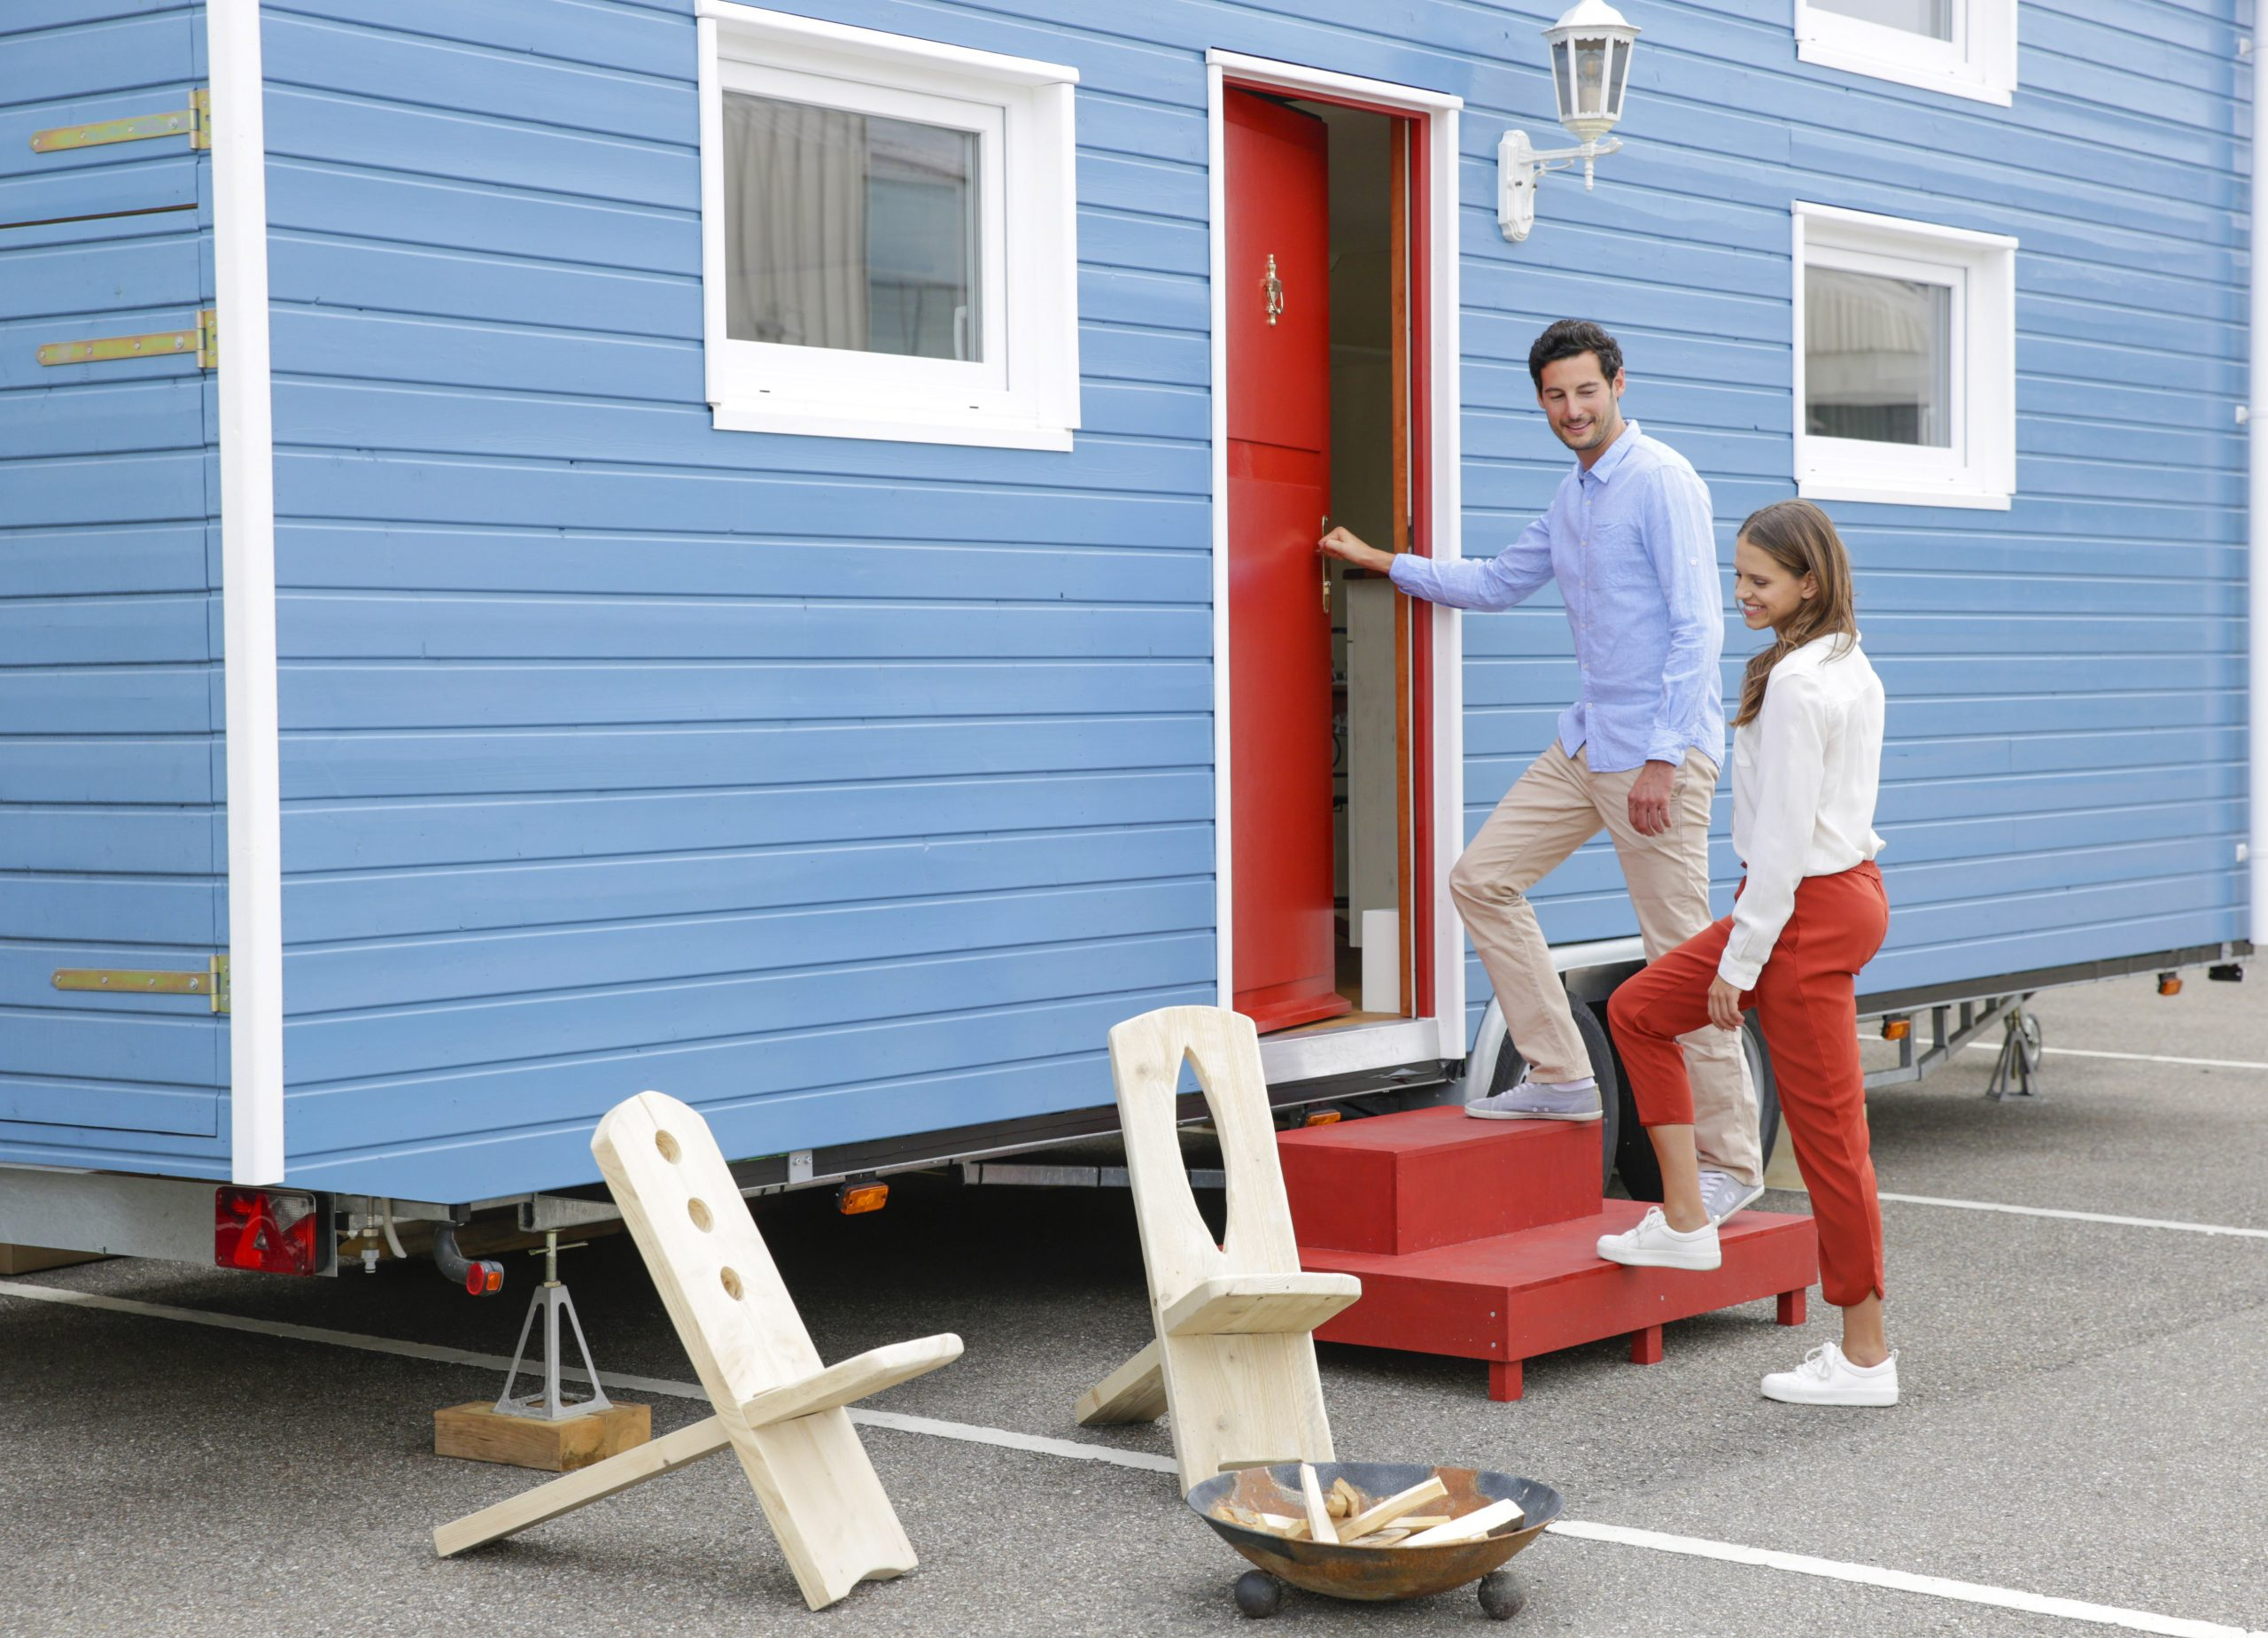 new-housing-paar-geht-in-tinyhouse